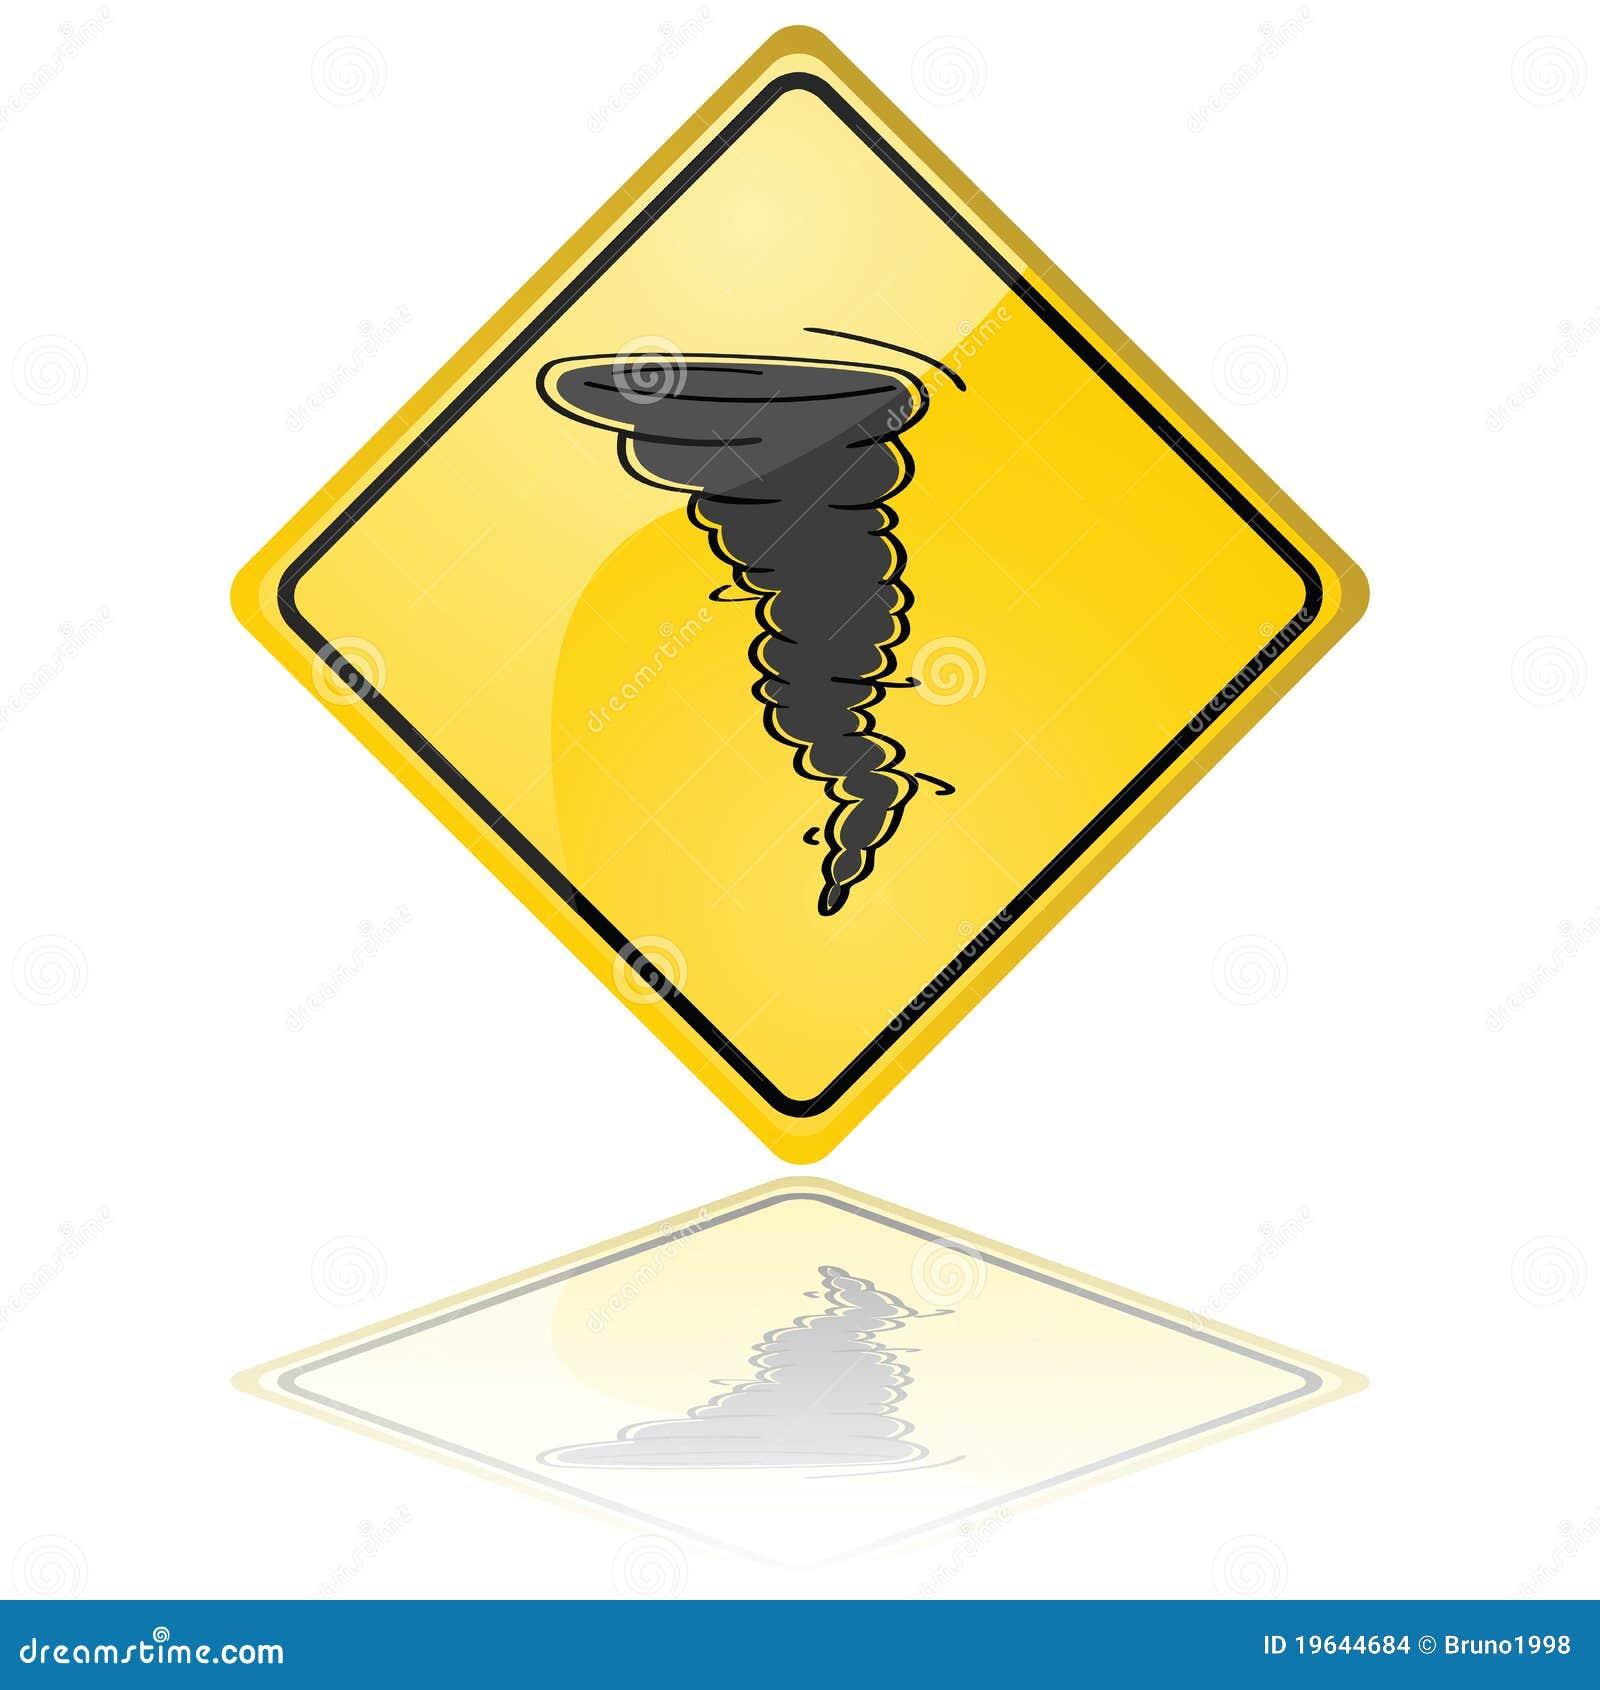 Tornado Warning Sign Stock Images Image 19644684